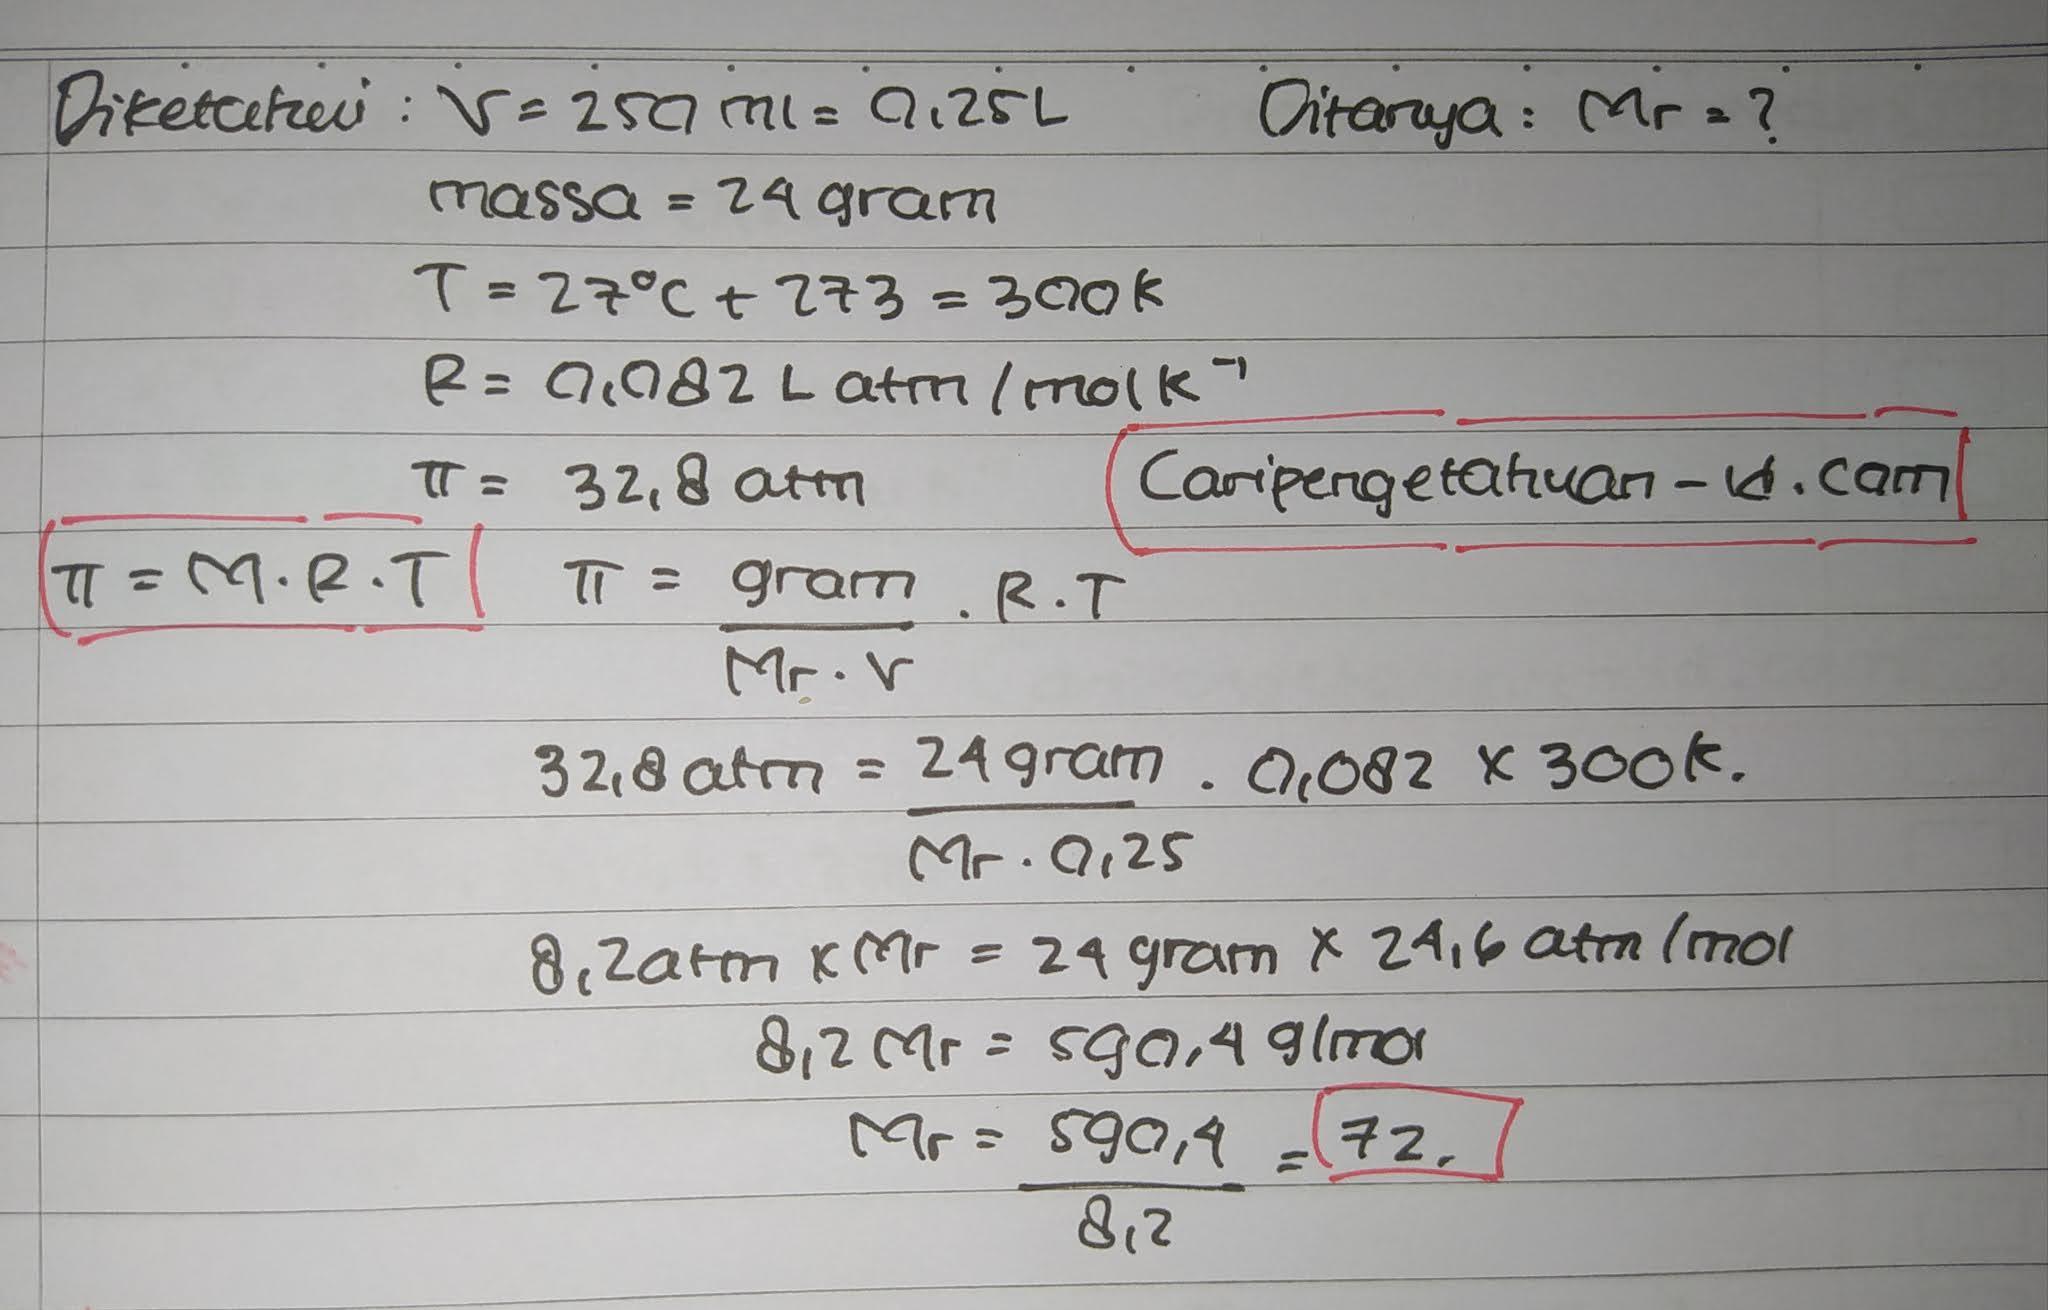 Dalam 250 mL suatu larutan terdapat 24 gram zat X yang bersifat nonelektrolit. Jika pada temperatur 27°C, tekanan osmosis larutan 32,8 atm, massa molekul relatif (Mr) zat X adalah......(R = 0,082 L atm/mol K-1)